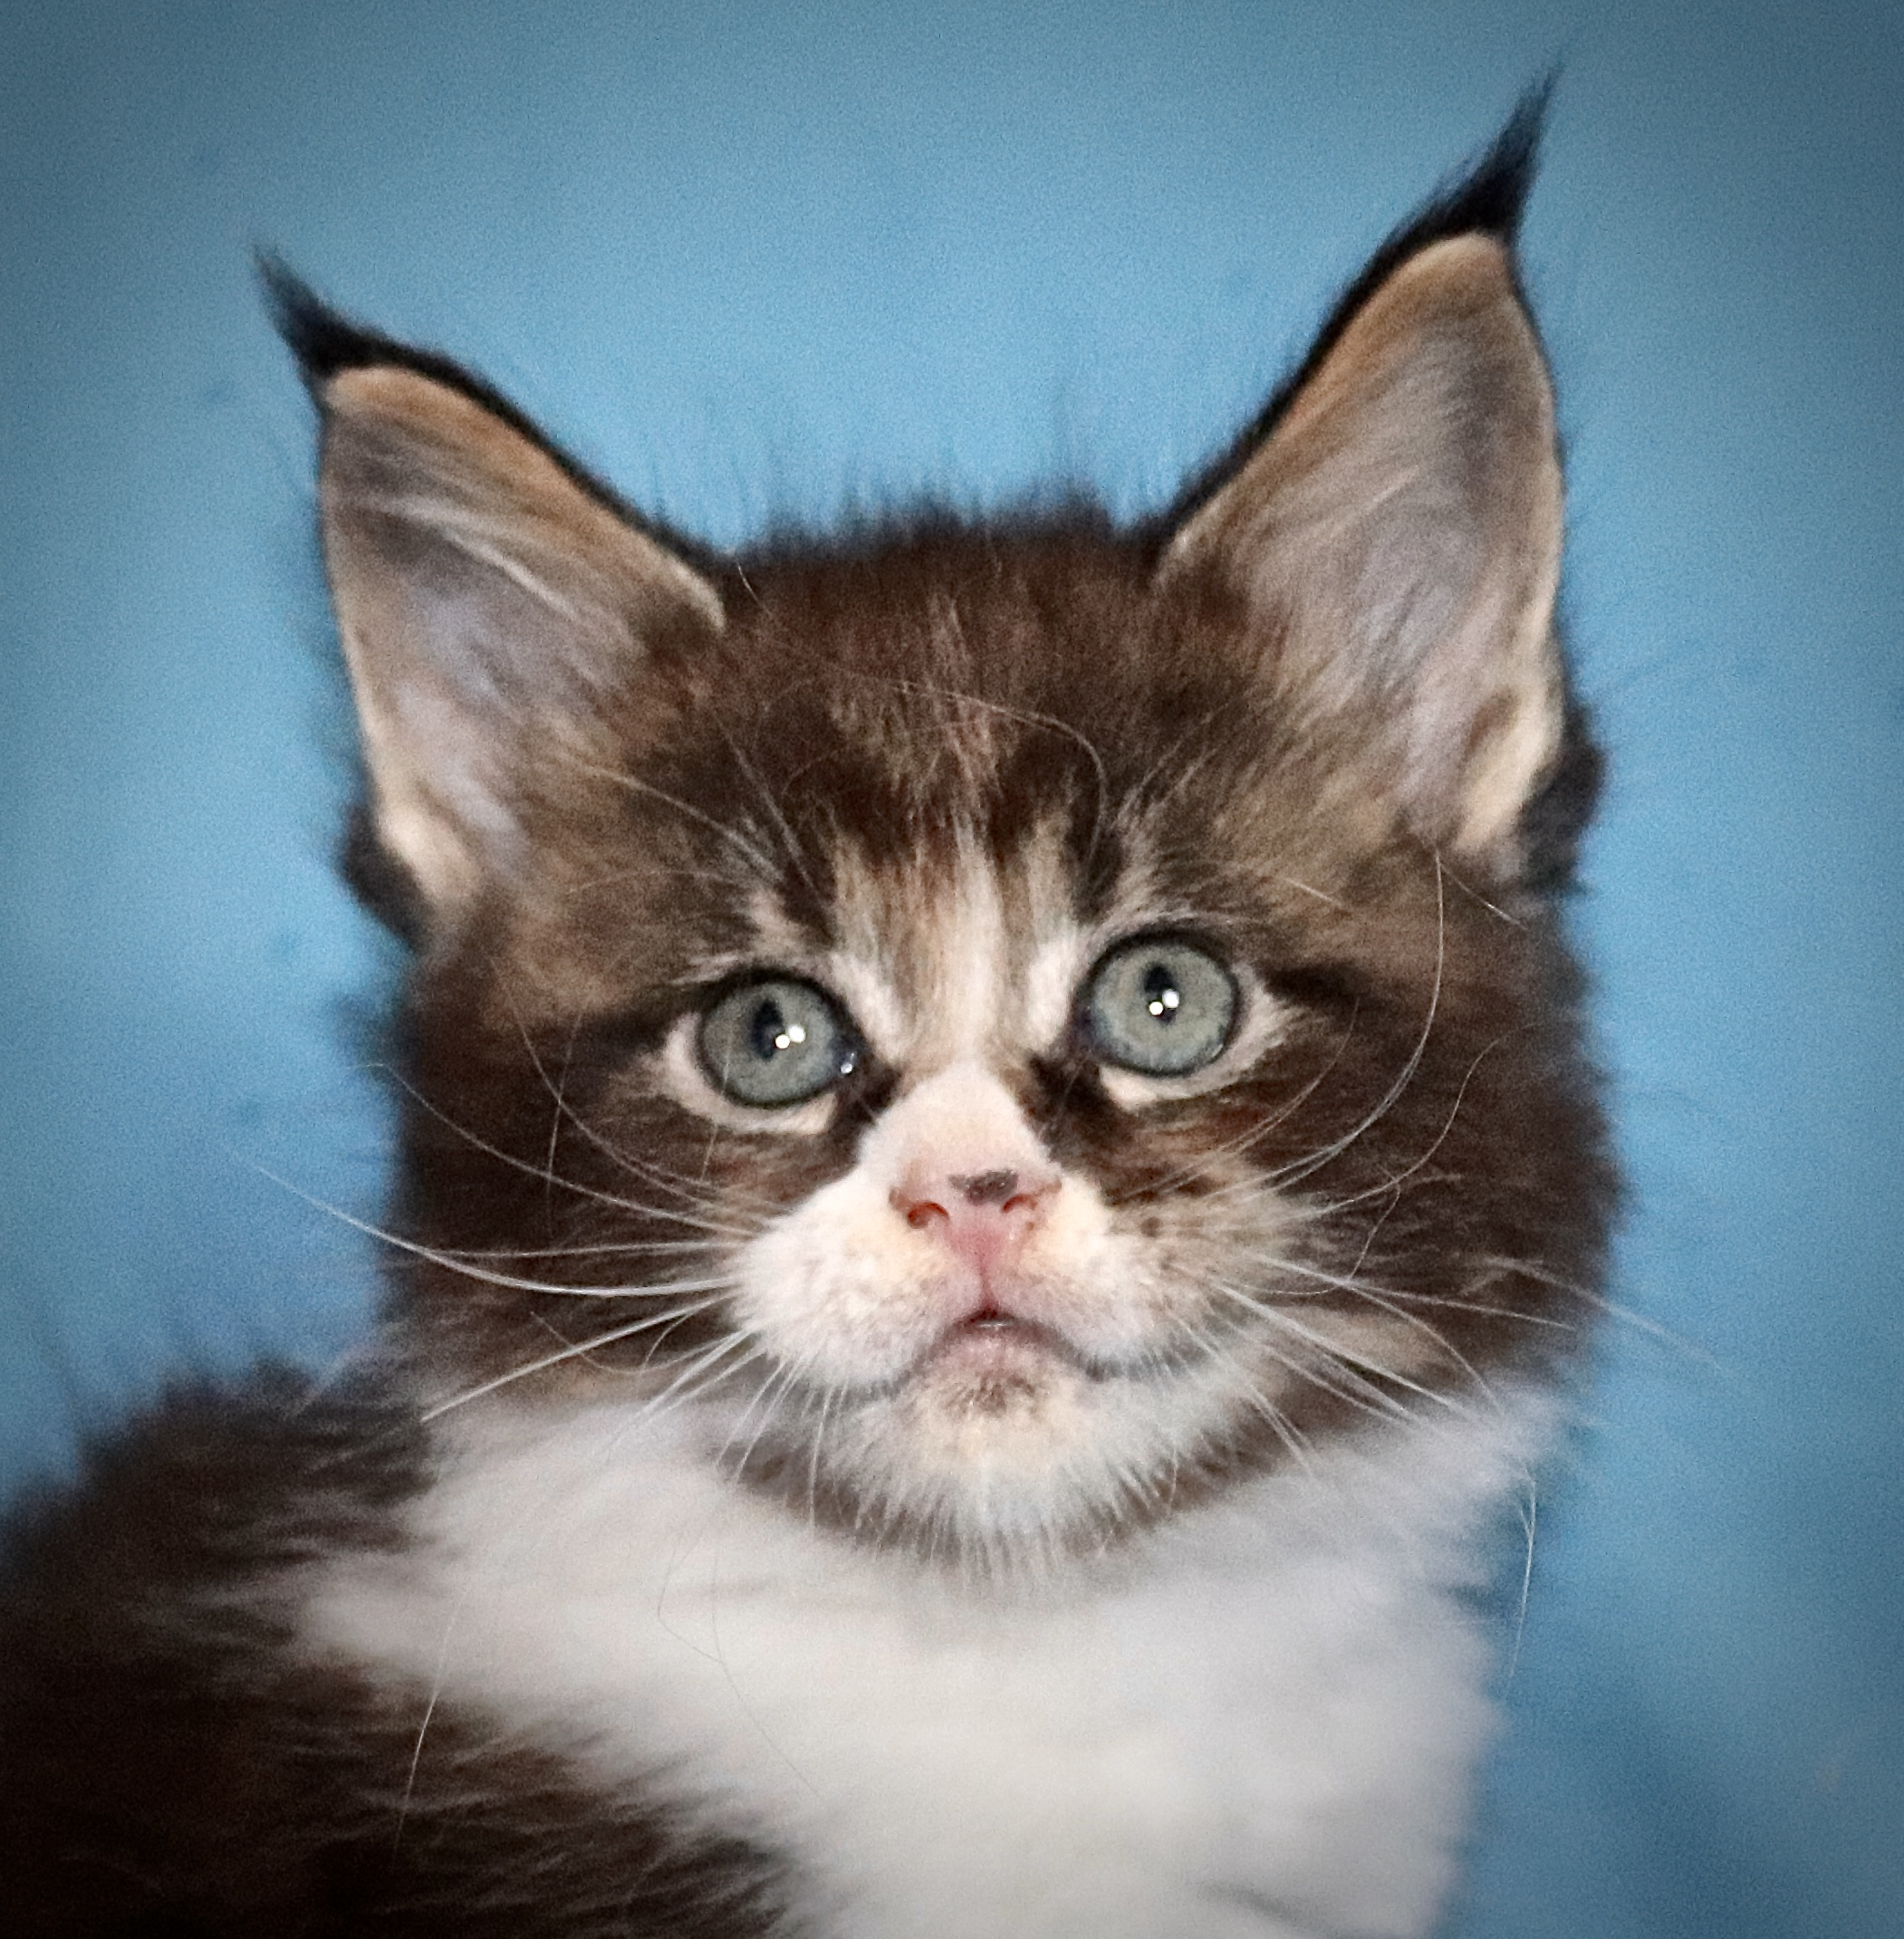 fotka kočky VRH J: JULIA VON ERILLIAN*CZ